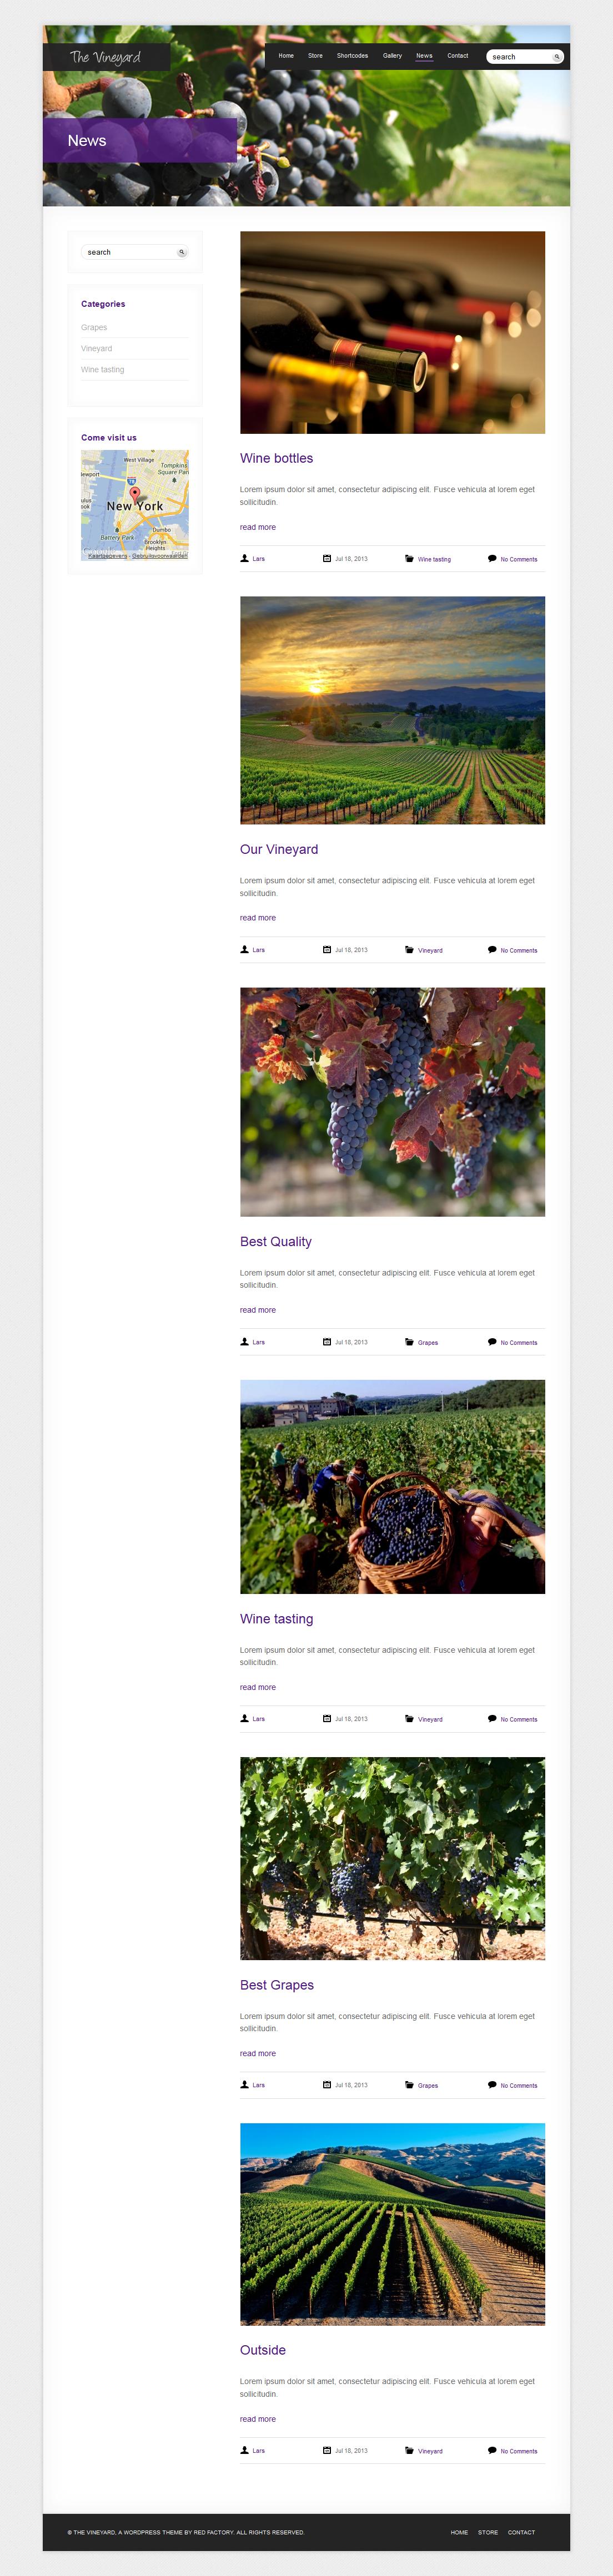 The Vineyard: A WordPress eCommerce Theme